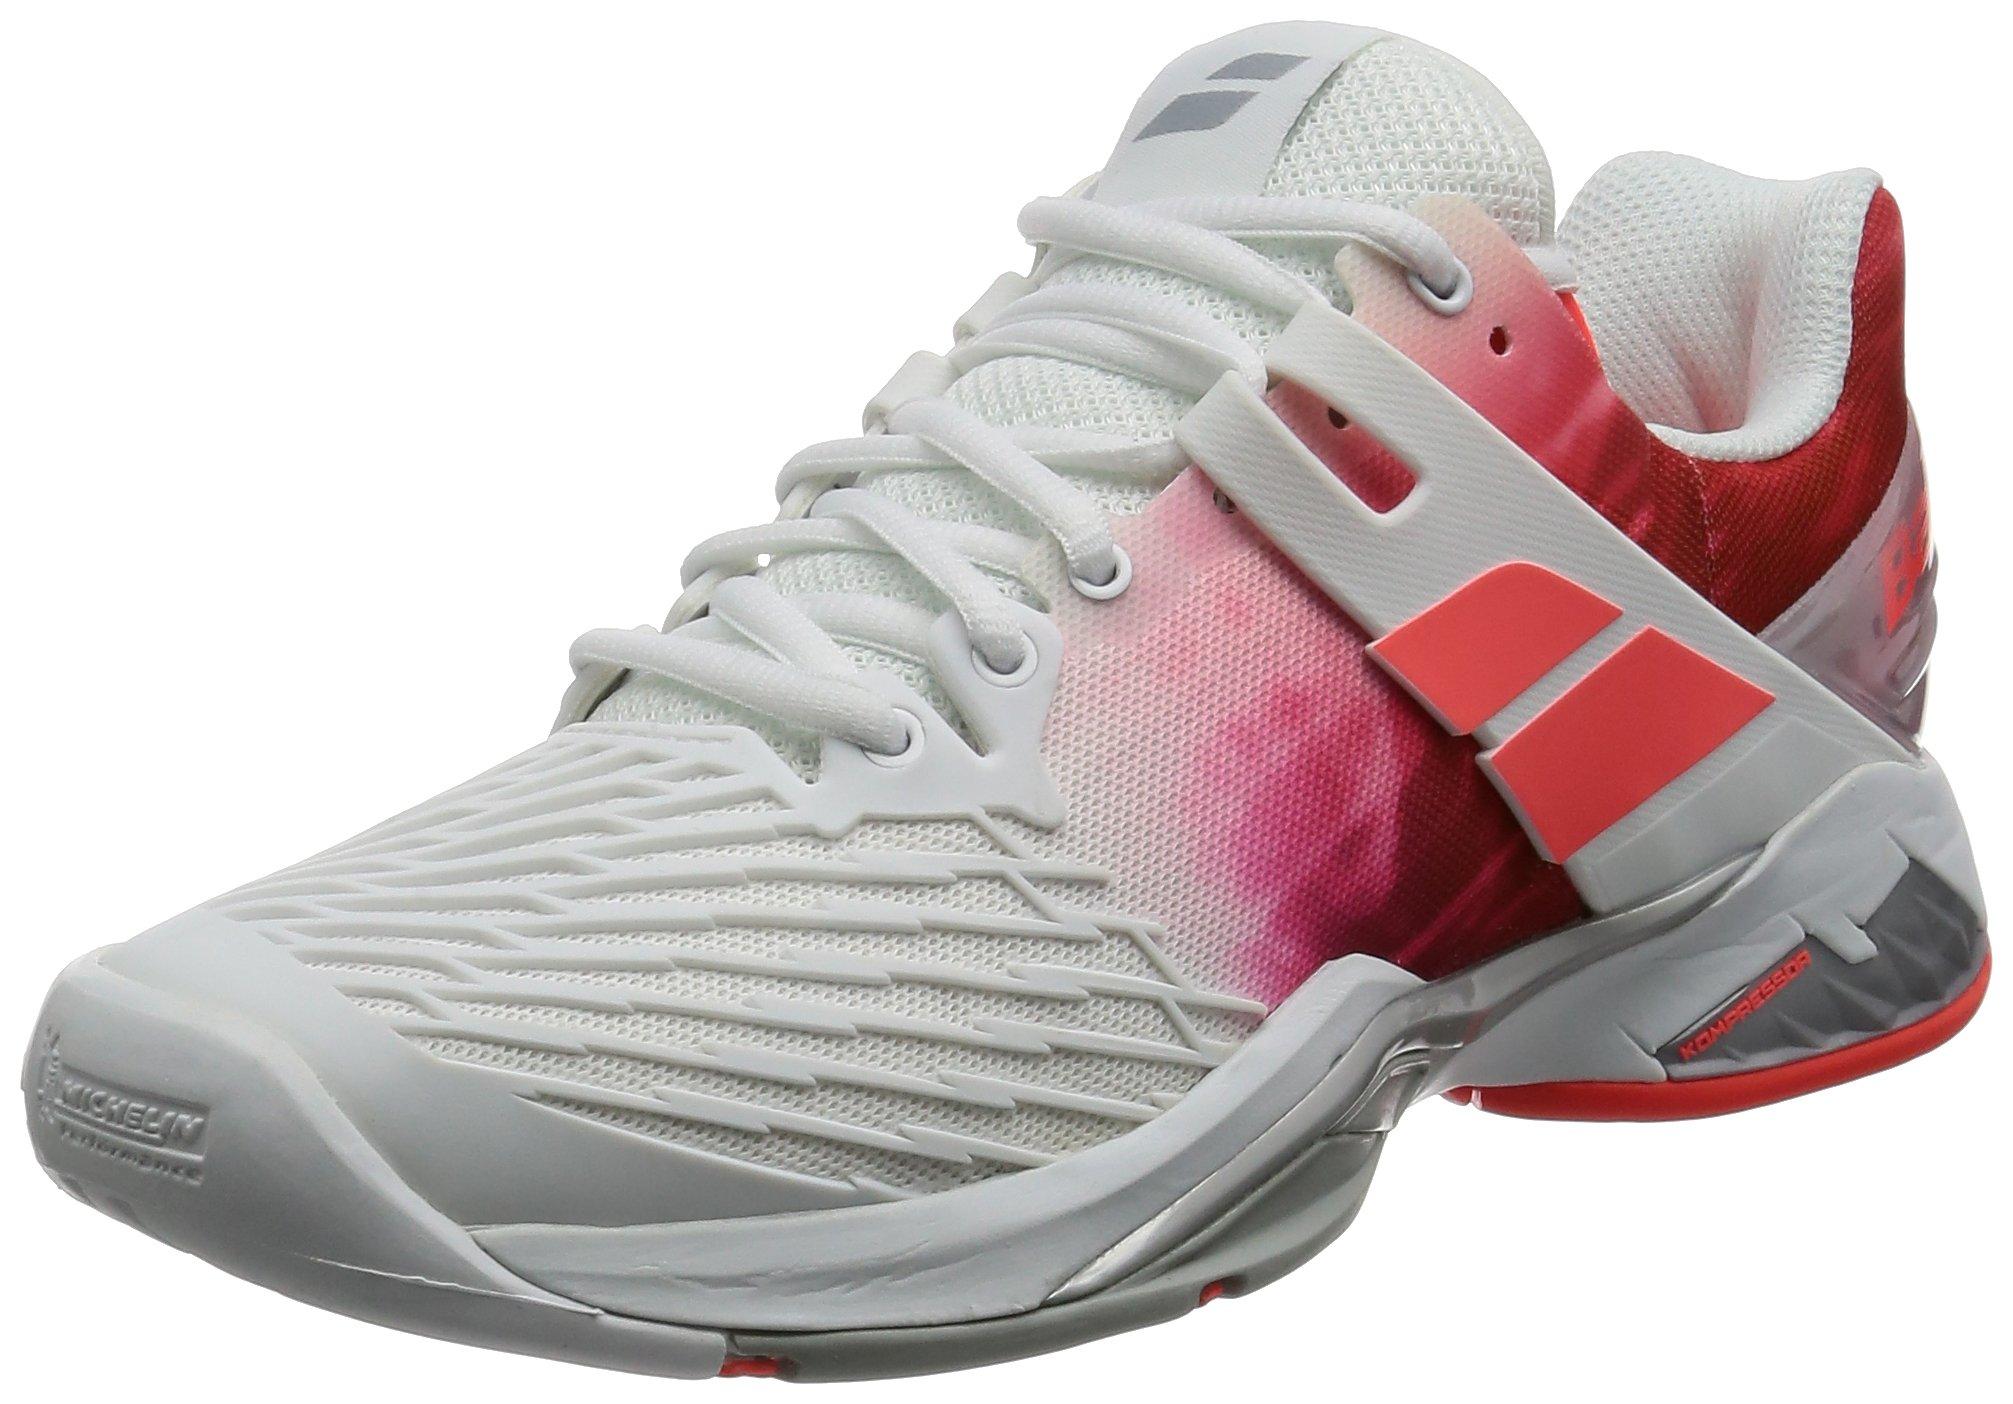 Babolat Women's Propulse Fury All Court Tennis Shoe-7 B(M) US-White/Pink